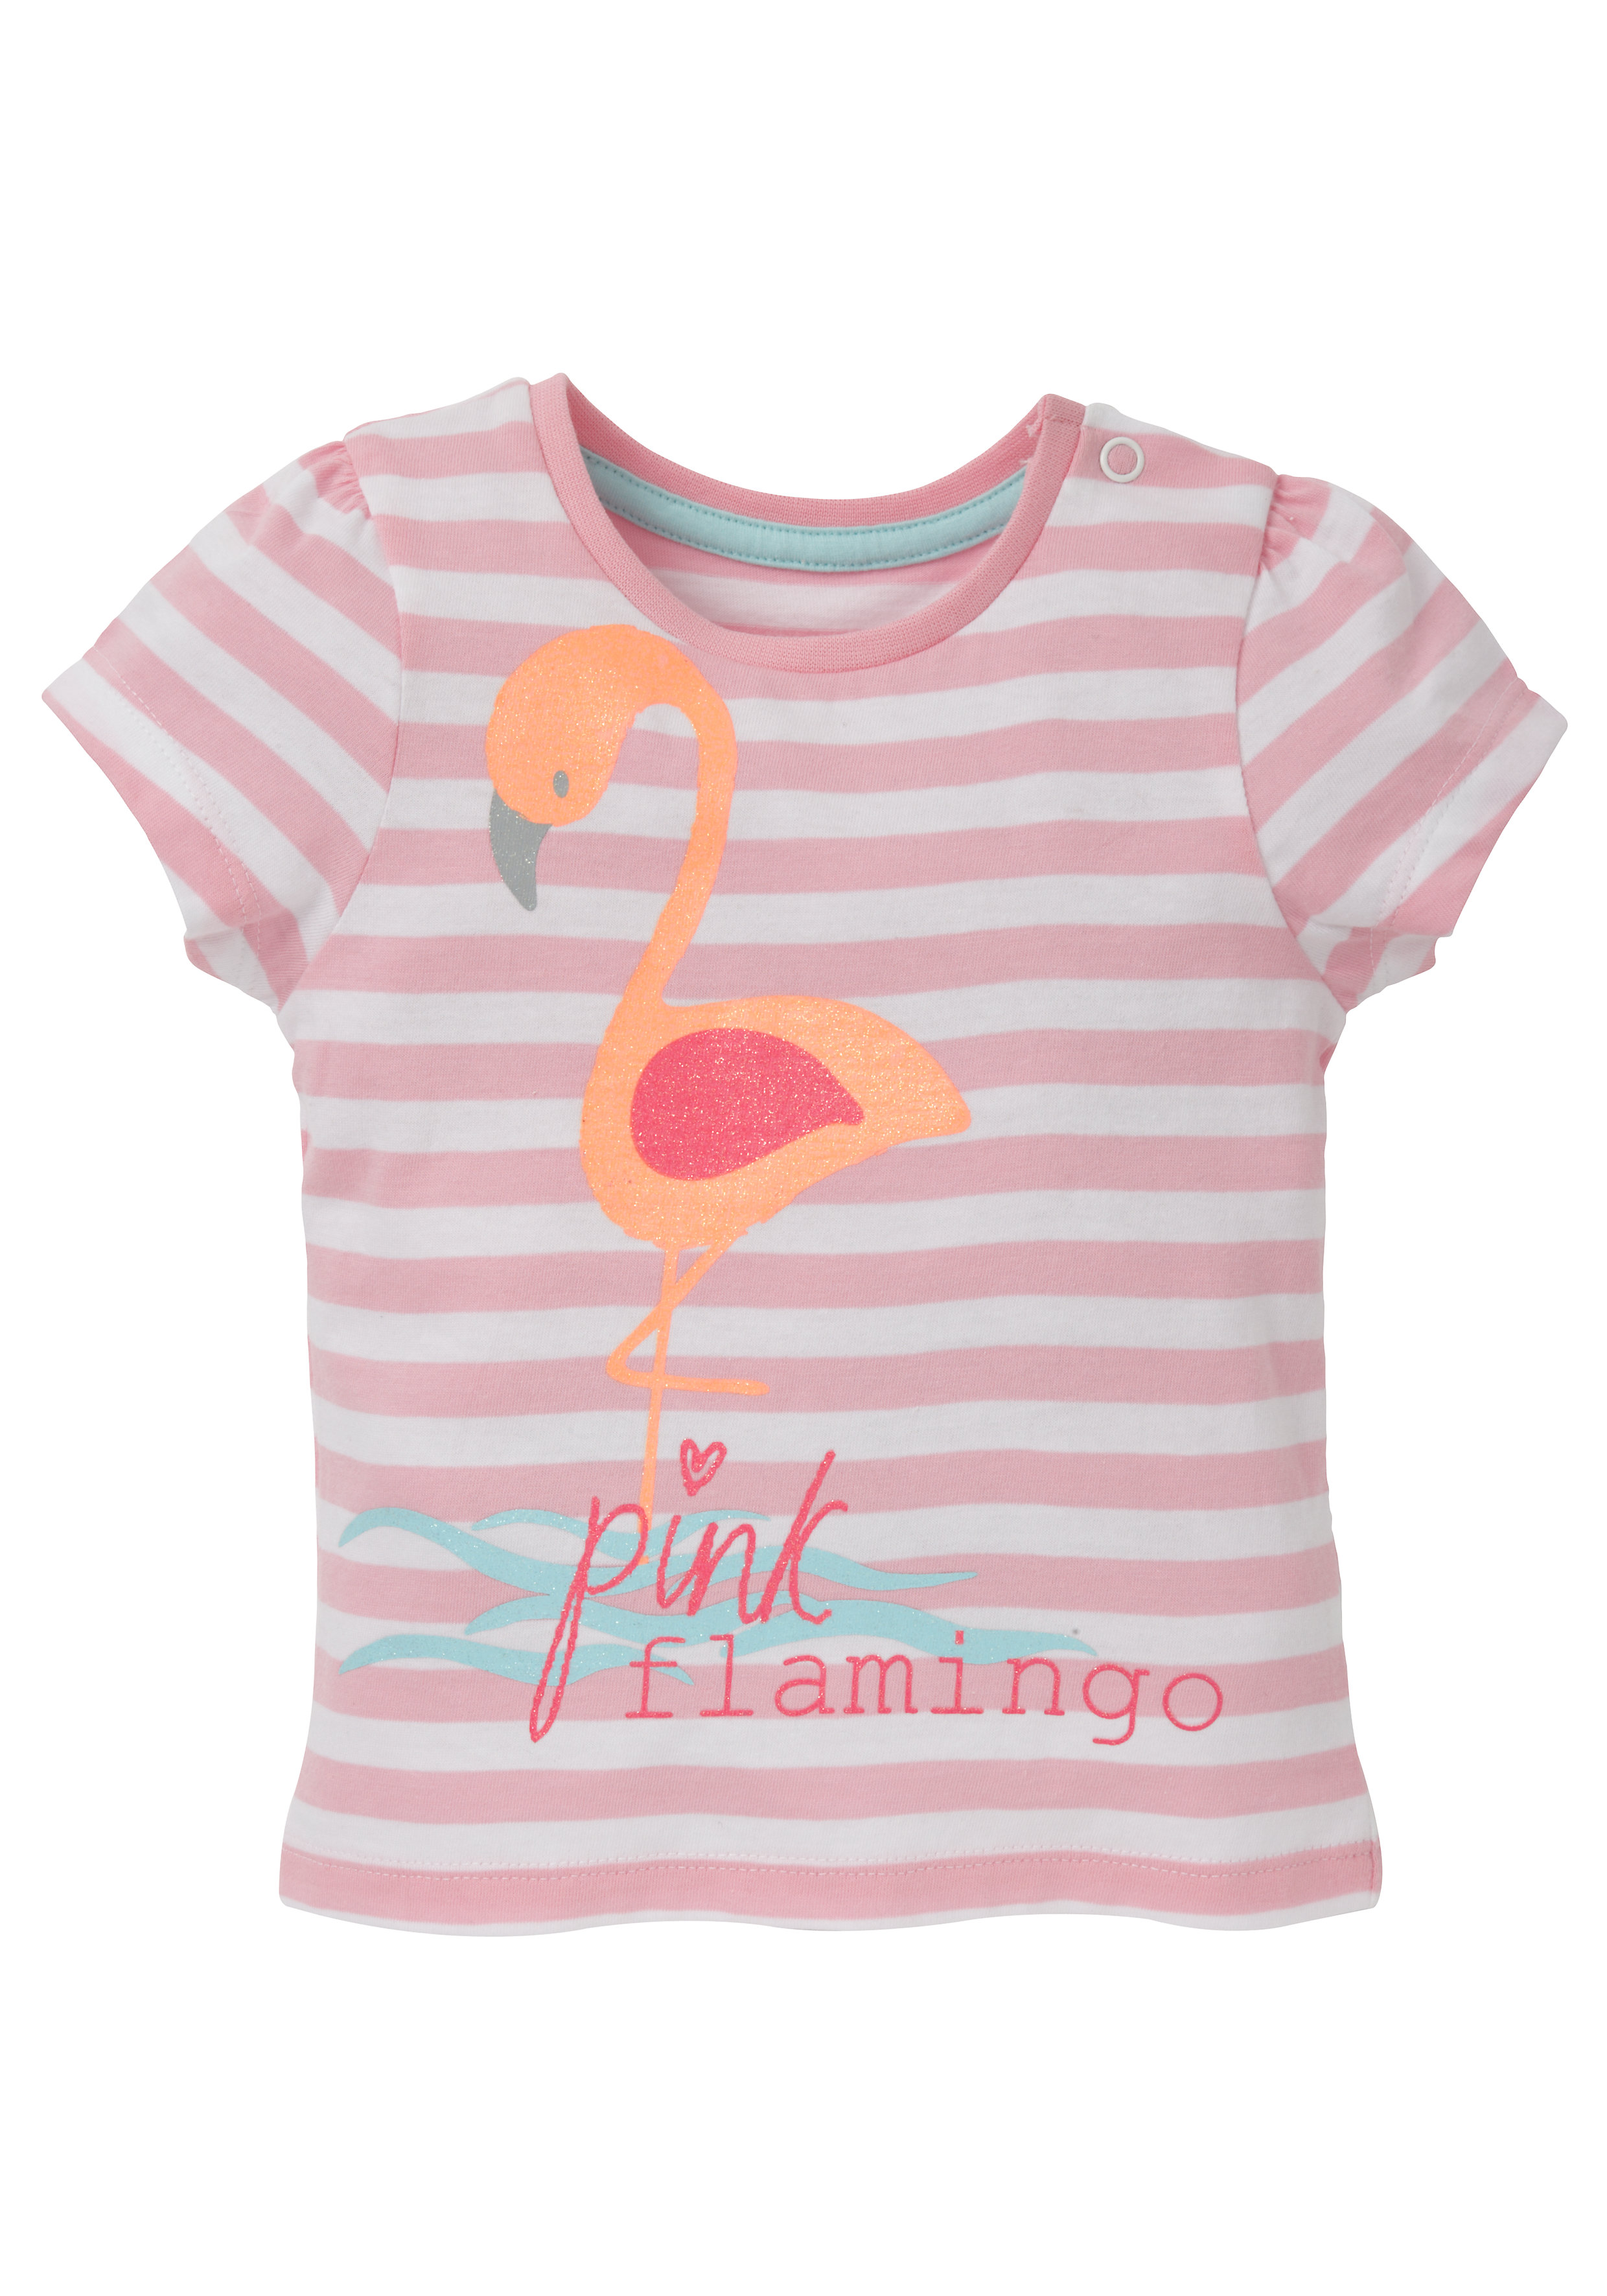 Mothercare | Girls Half Sleeves T-Shirt Striped Flamingo Print - Pink